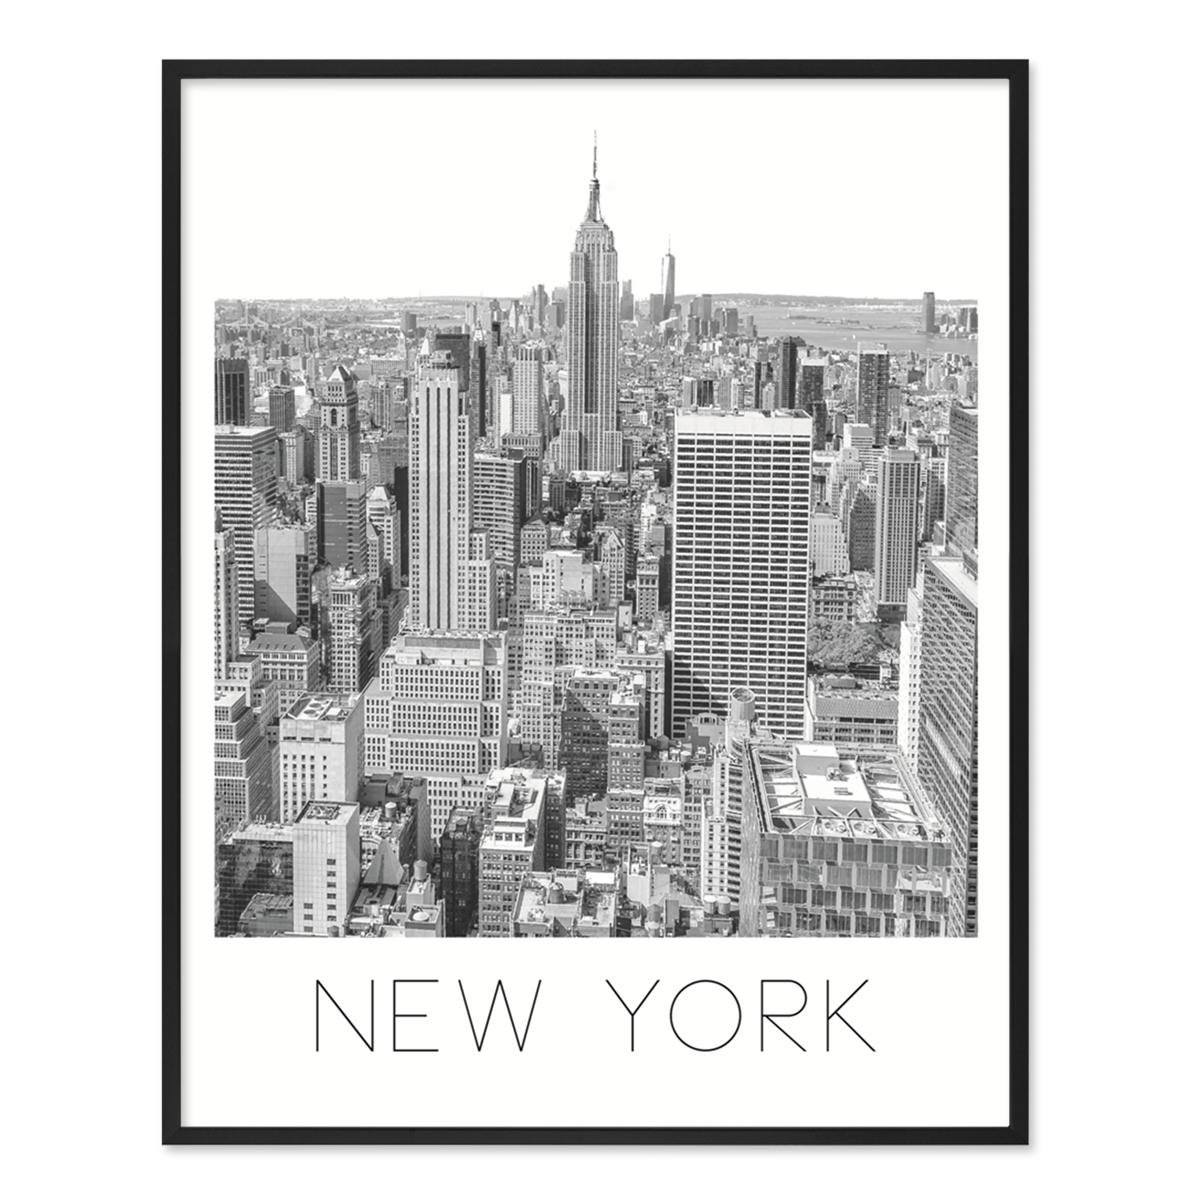 poster 39 new york 39 40x50 cm schwarz weiss motiv manhatten skyline poster st dte karten. Black Bedroom Furniture Sets. Home Design Ideas